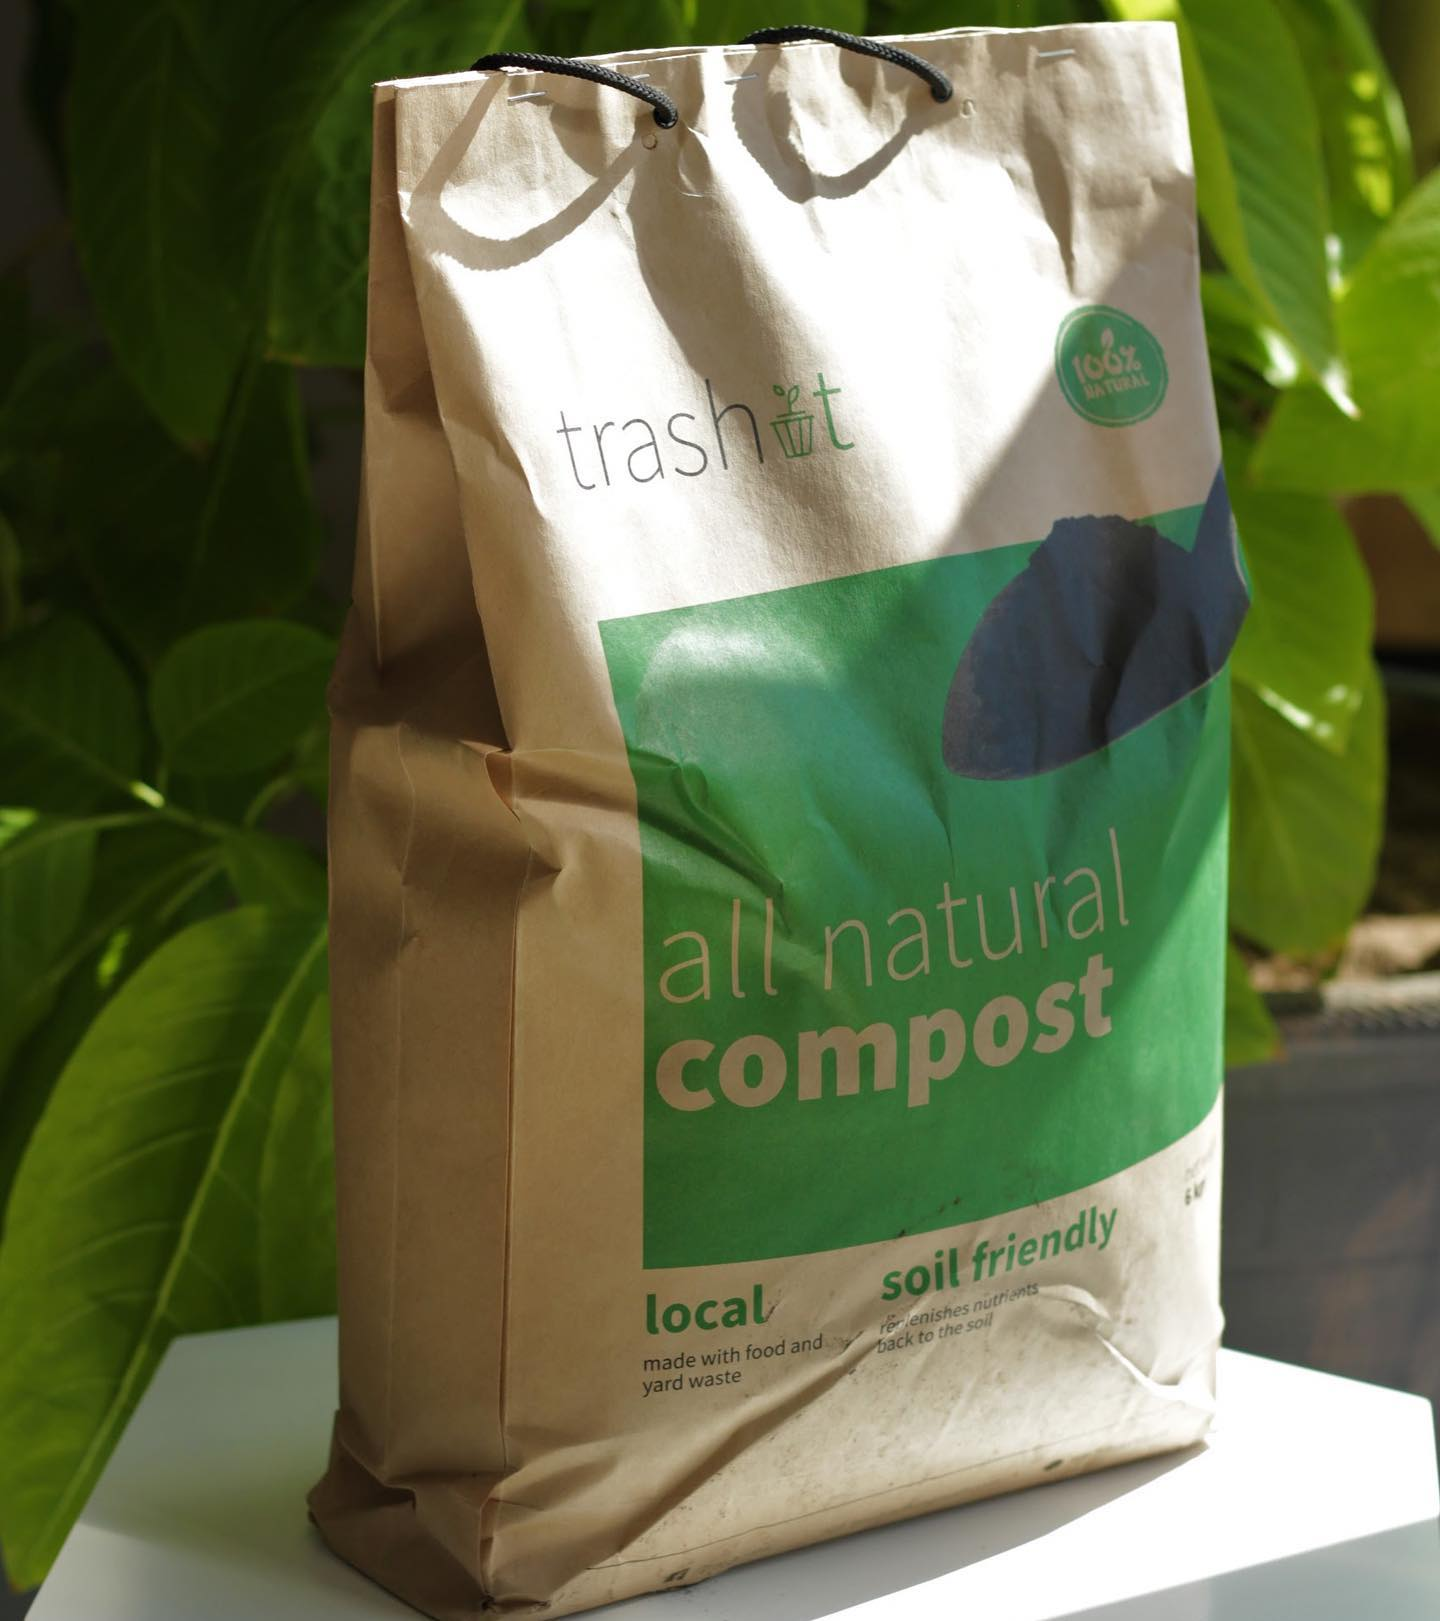 Trashit compost Pakistan